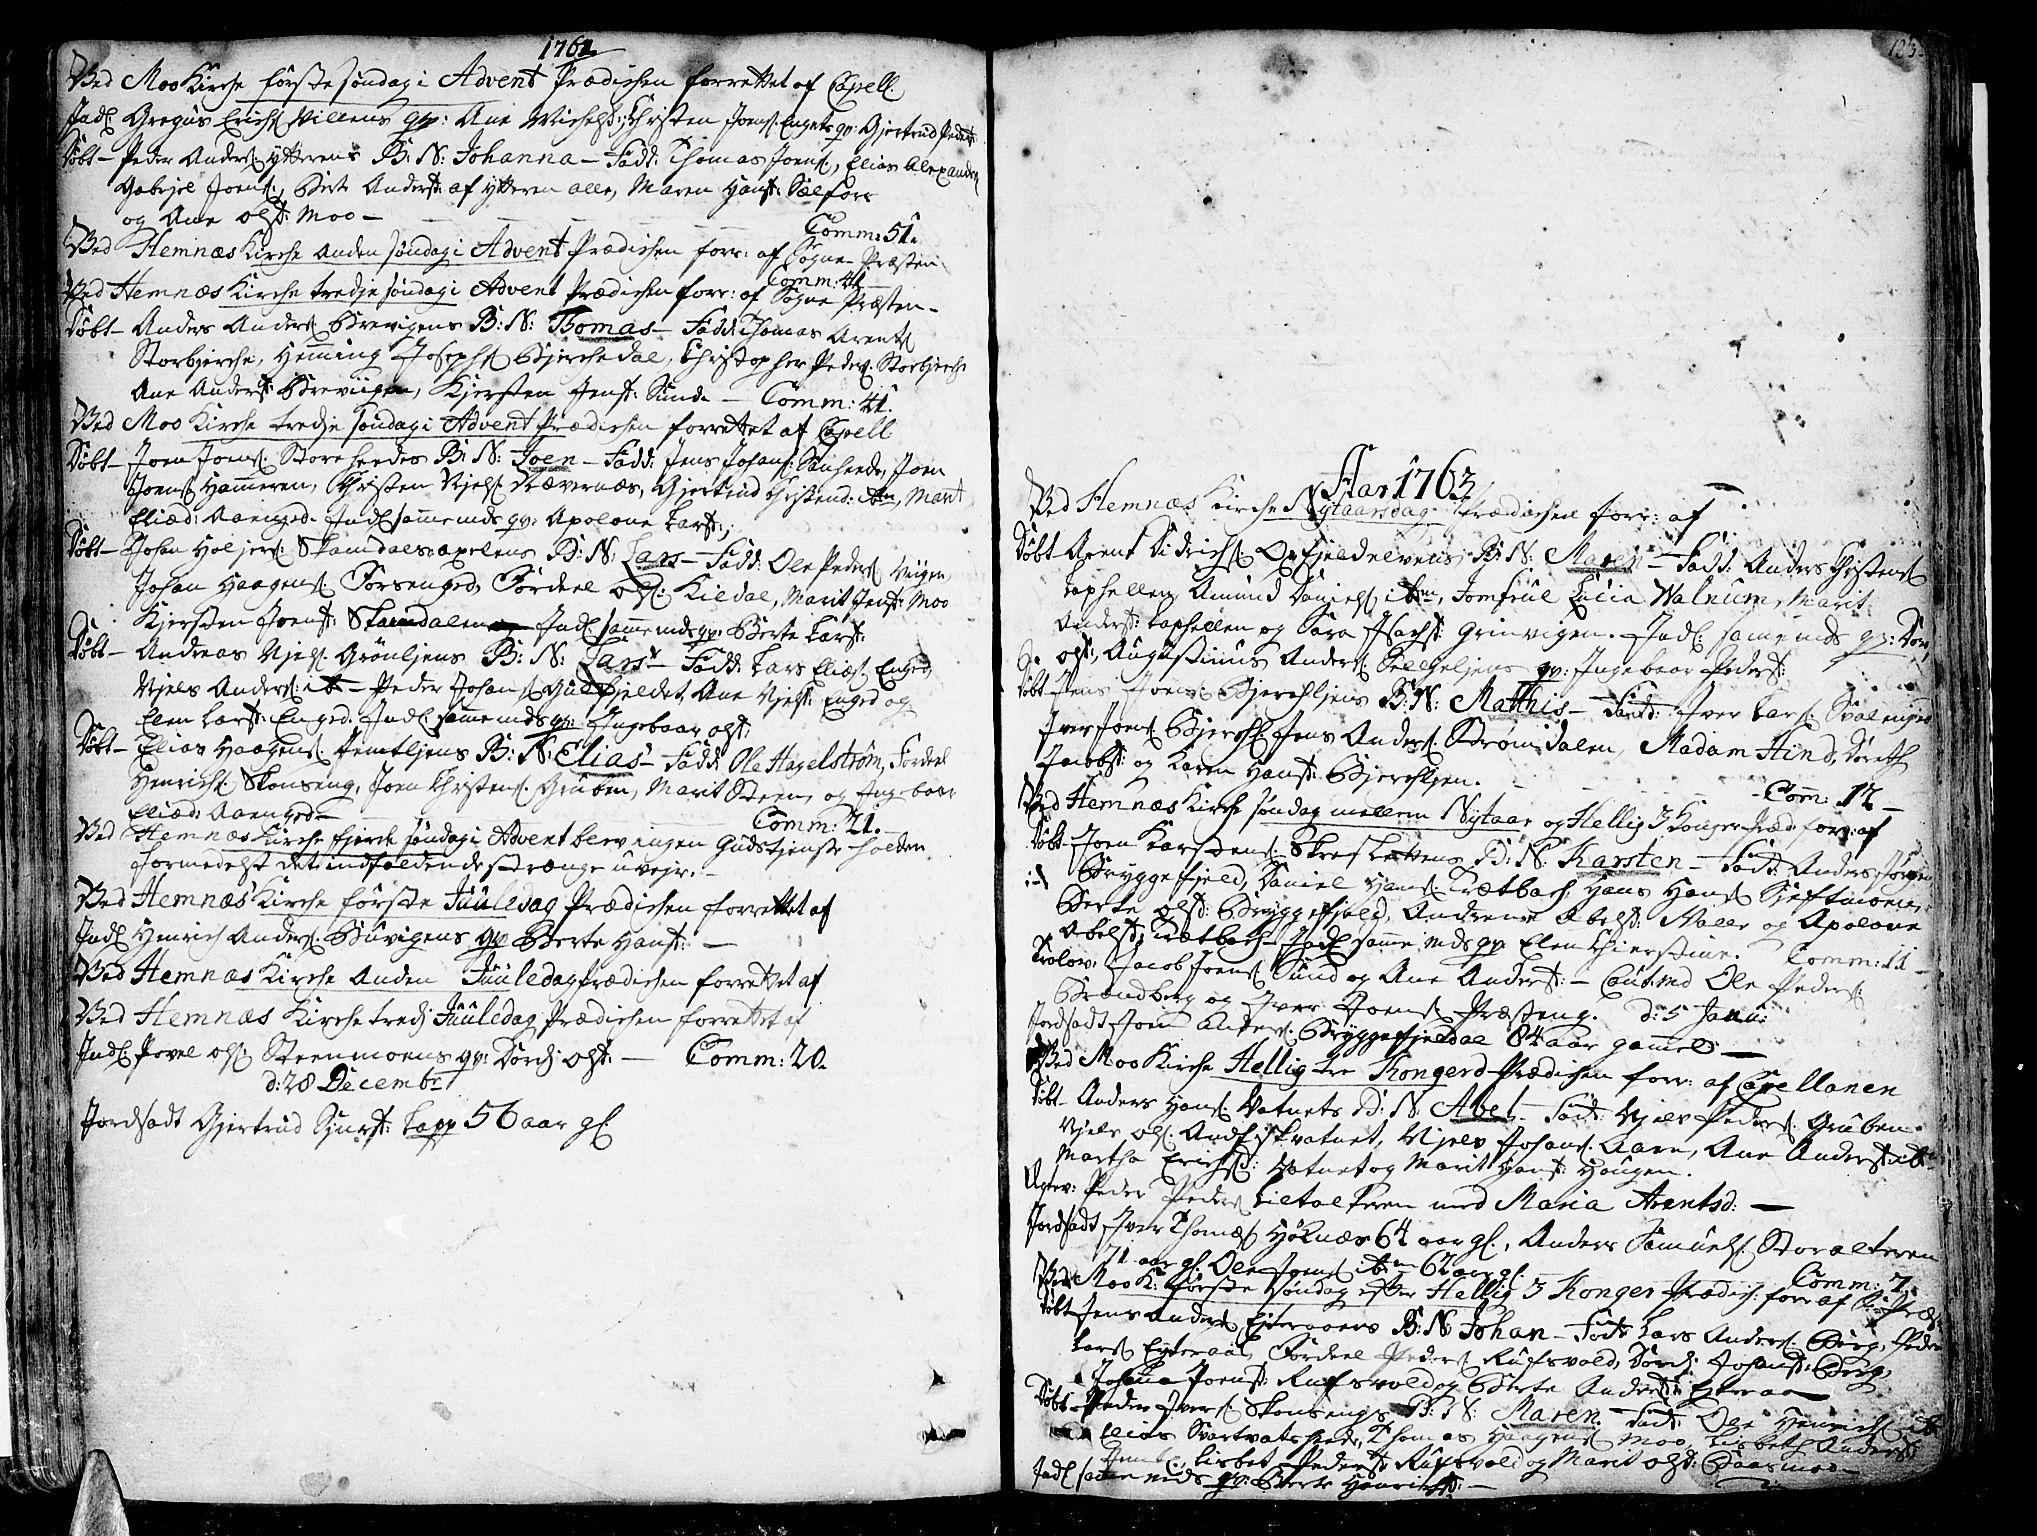 SAT, Ministerialprotokoller, klokkerbøker og fødselsregistre - Nordland, 825/L0348: Ministerialbok nr. 825A04, 1752-1788, s. 123